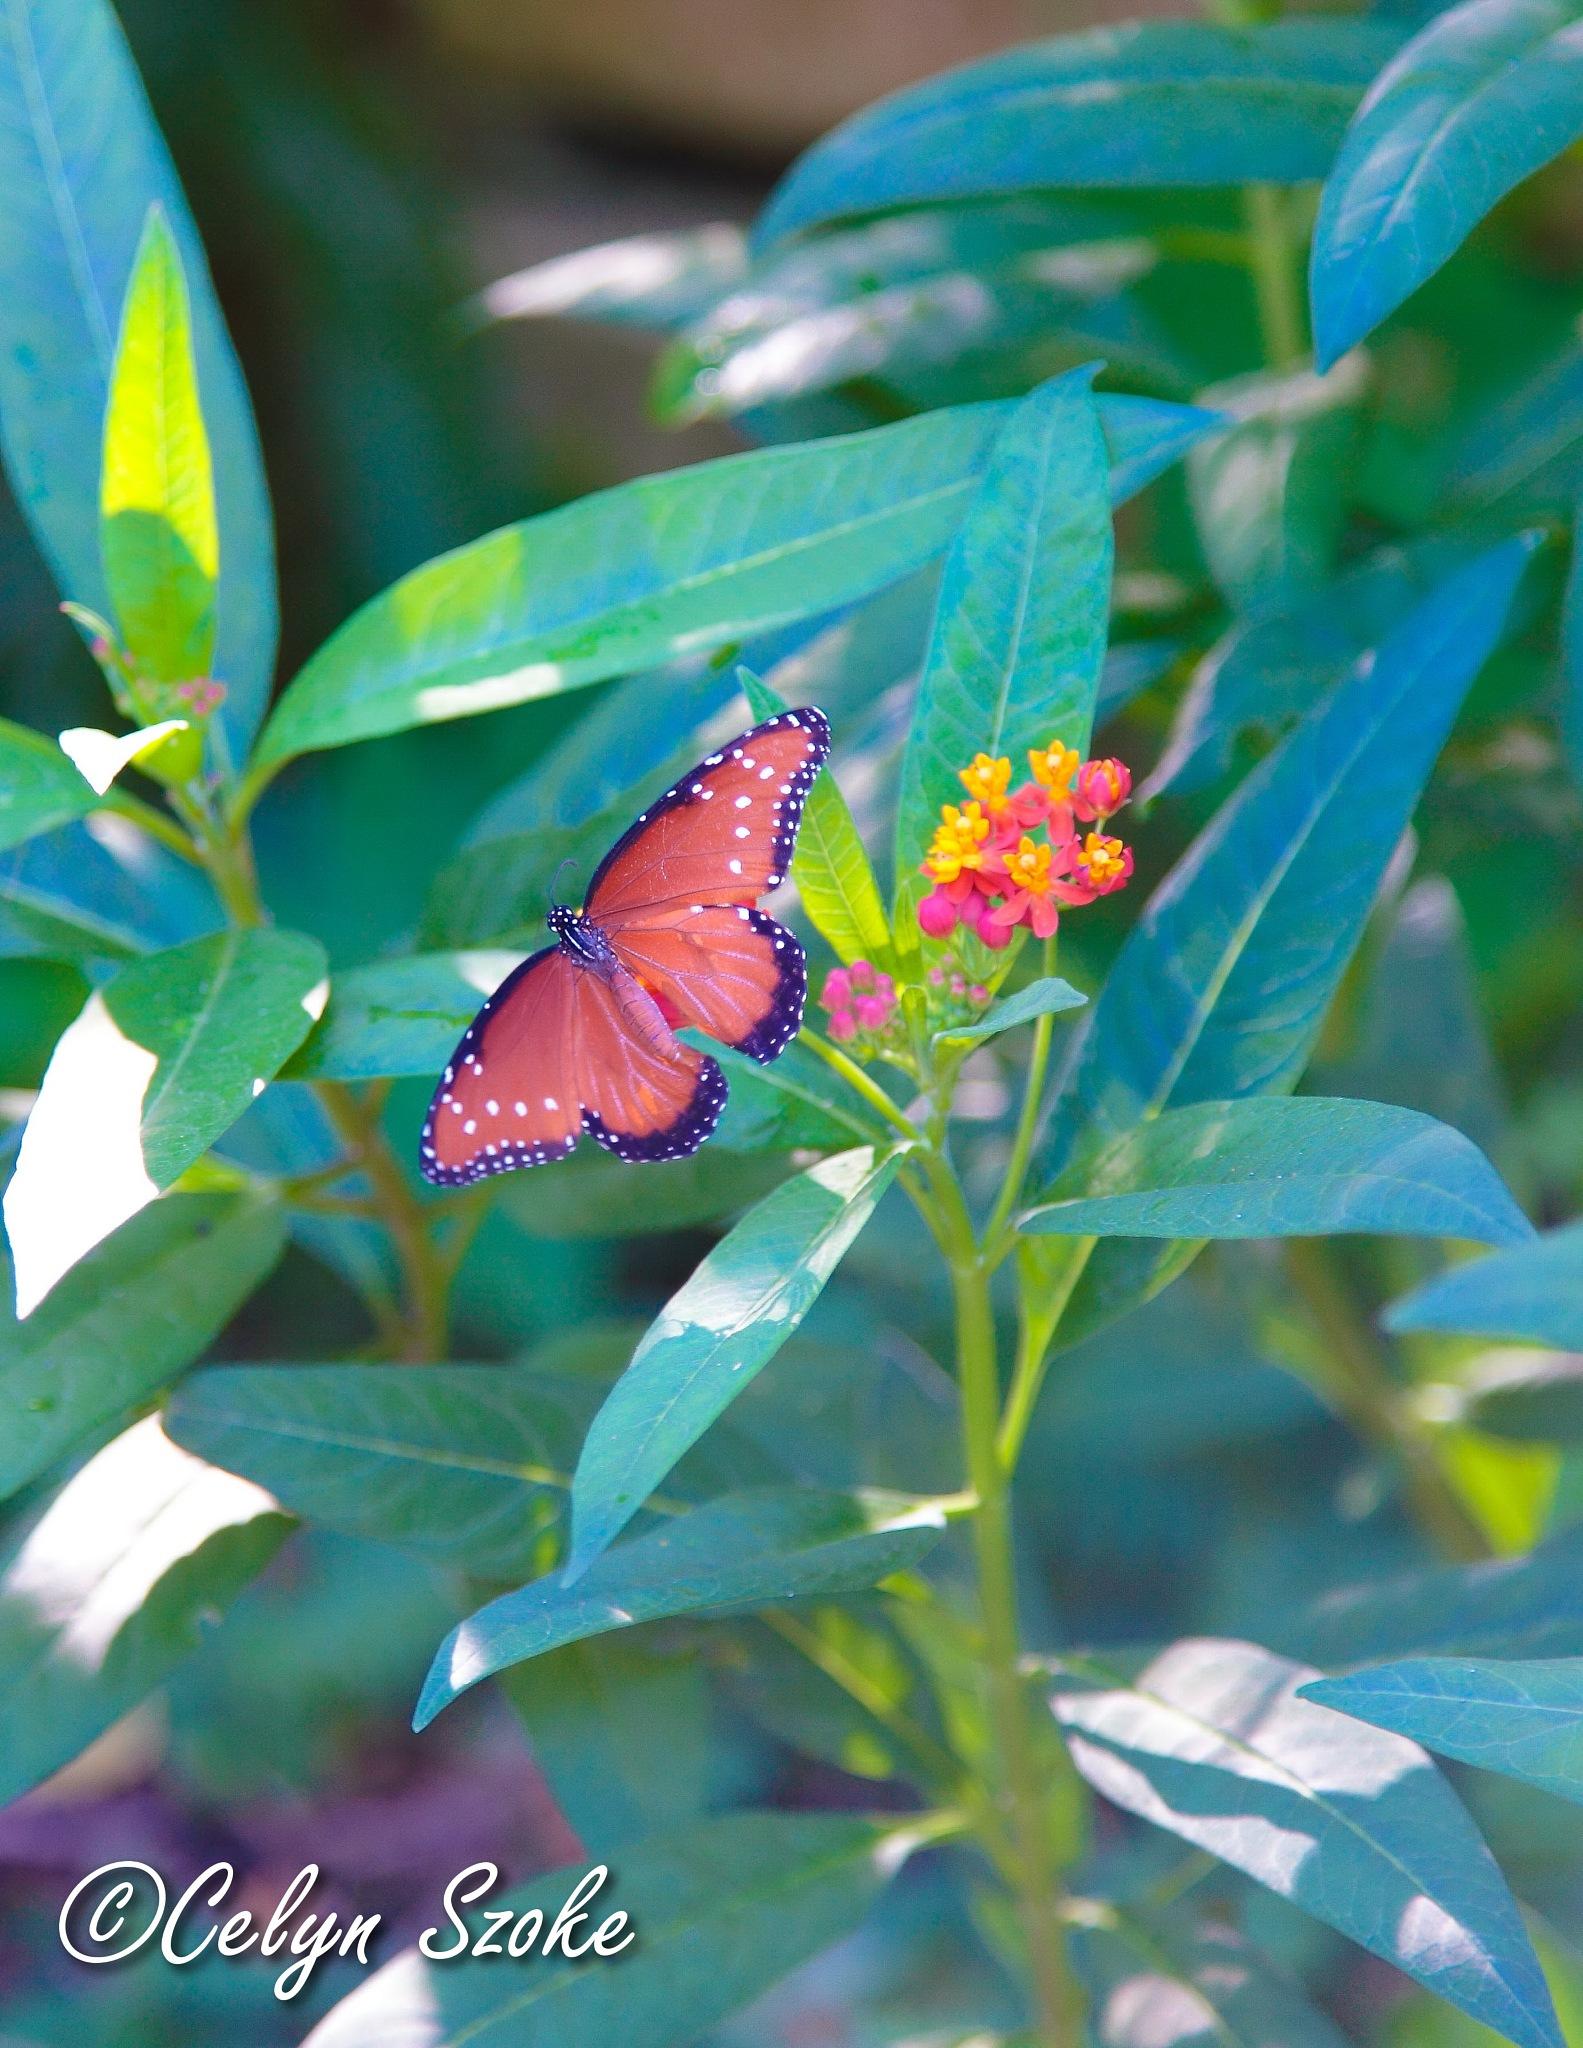 botanical butterfly by Celyn Szoke